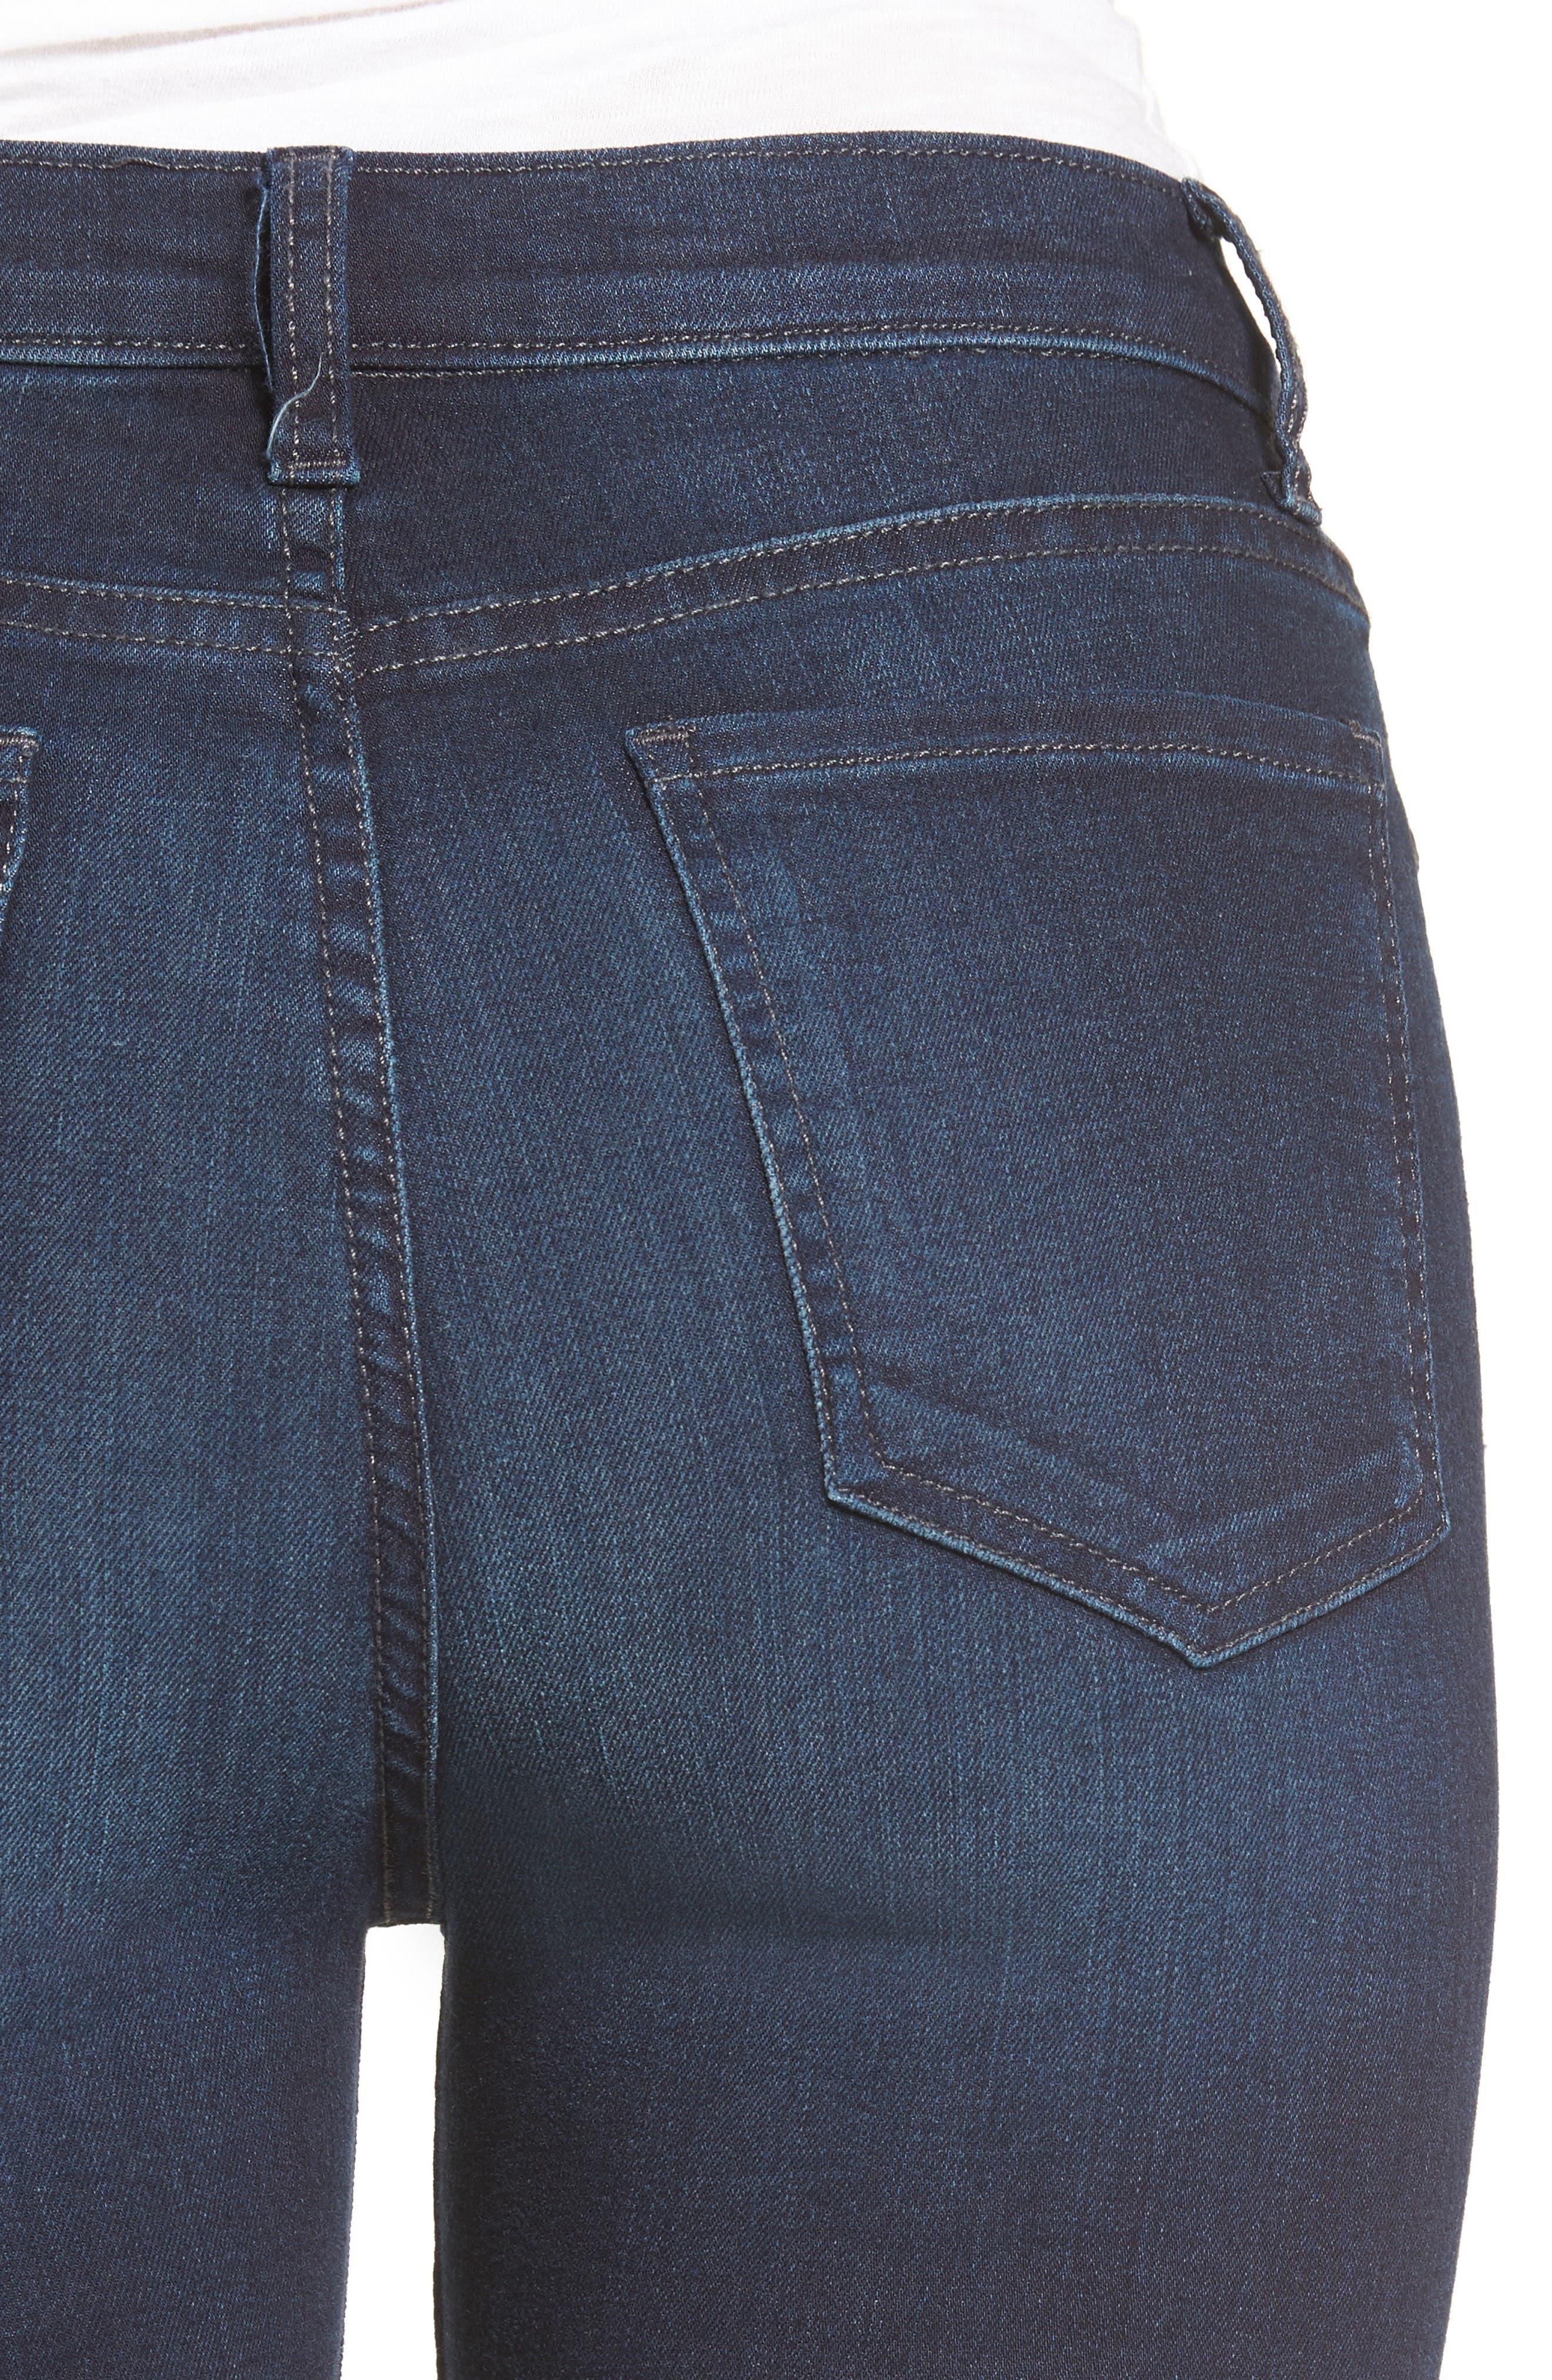 Mia High Waist Skinny Jeans,                             Alternate thumbnail 4, color,